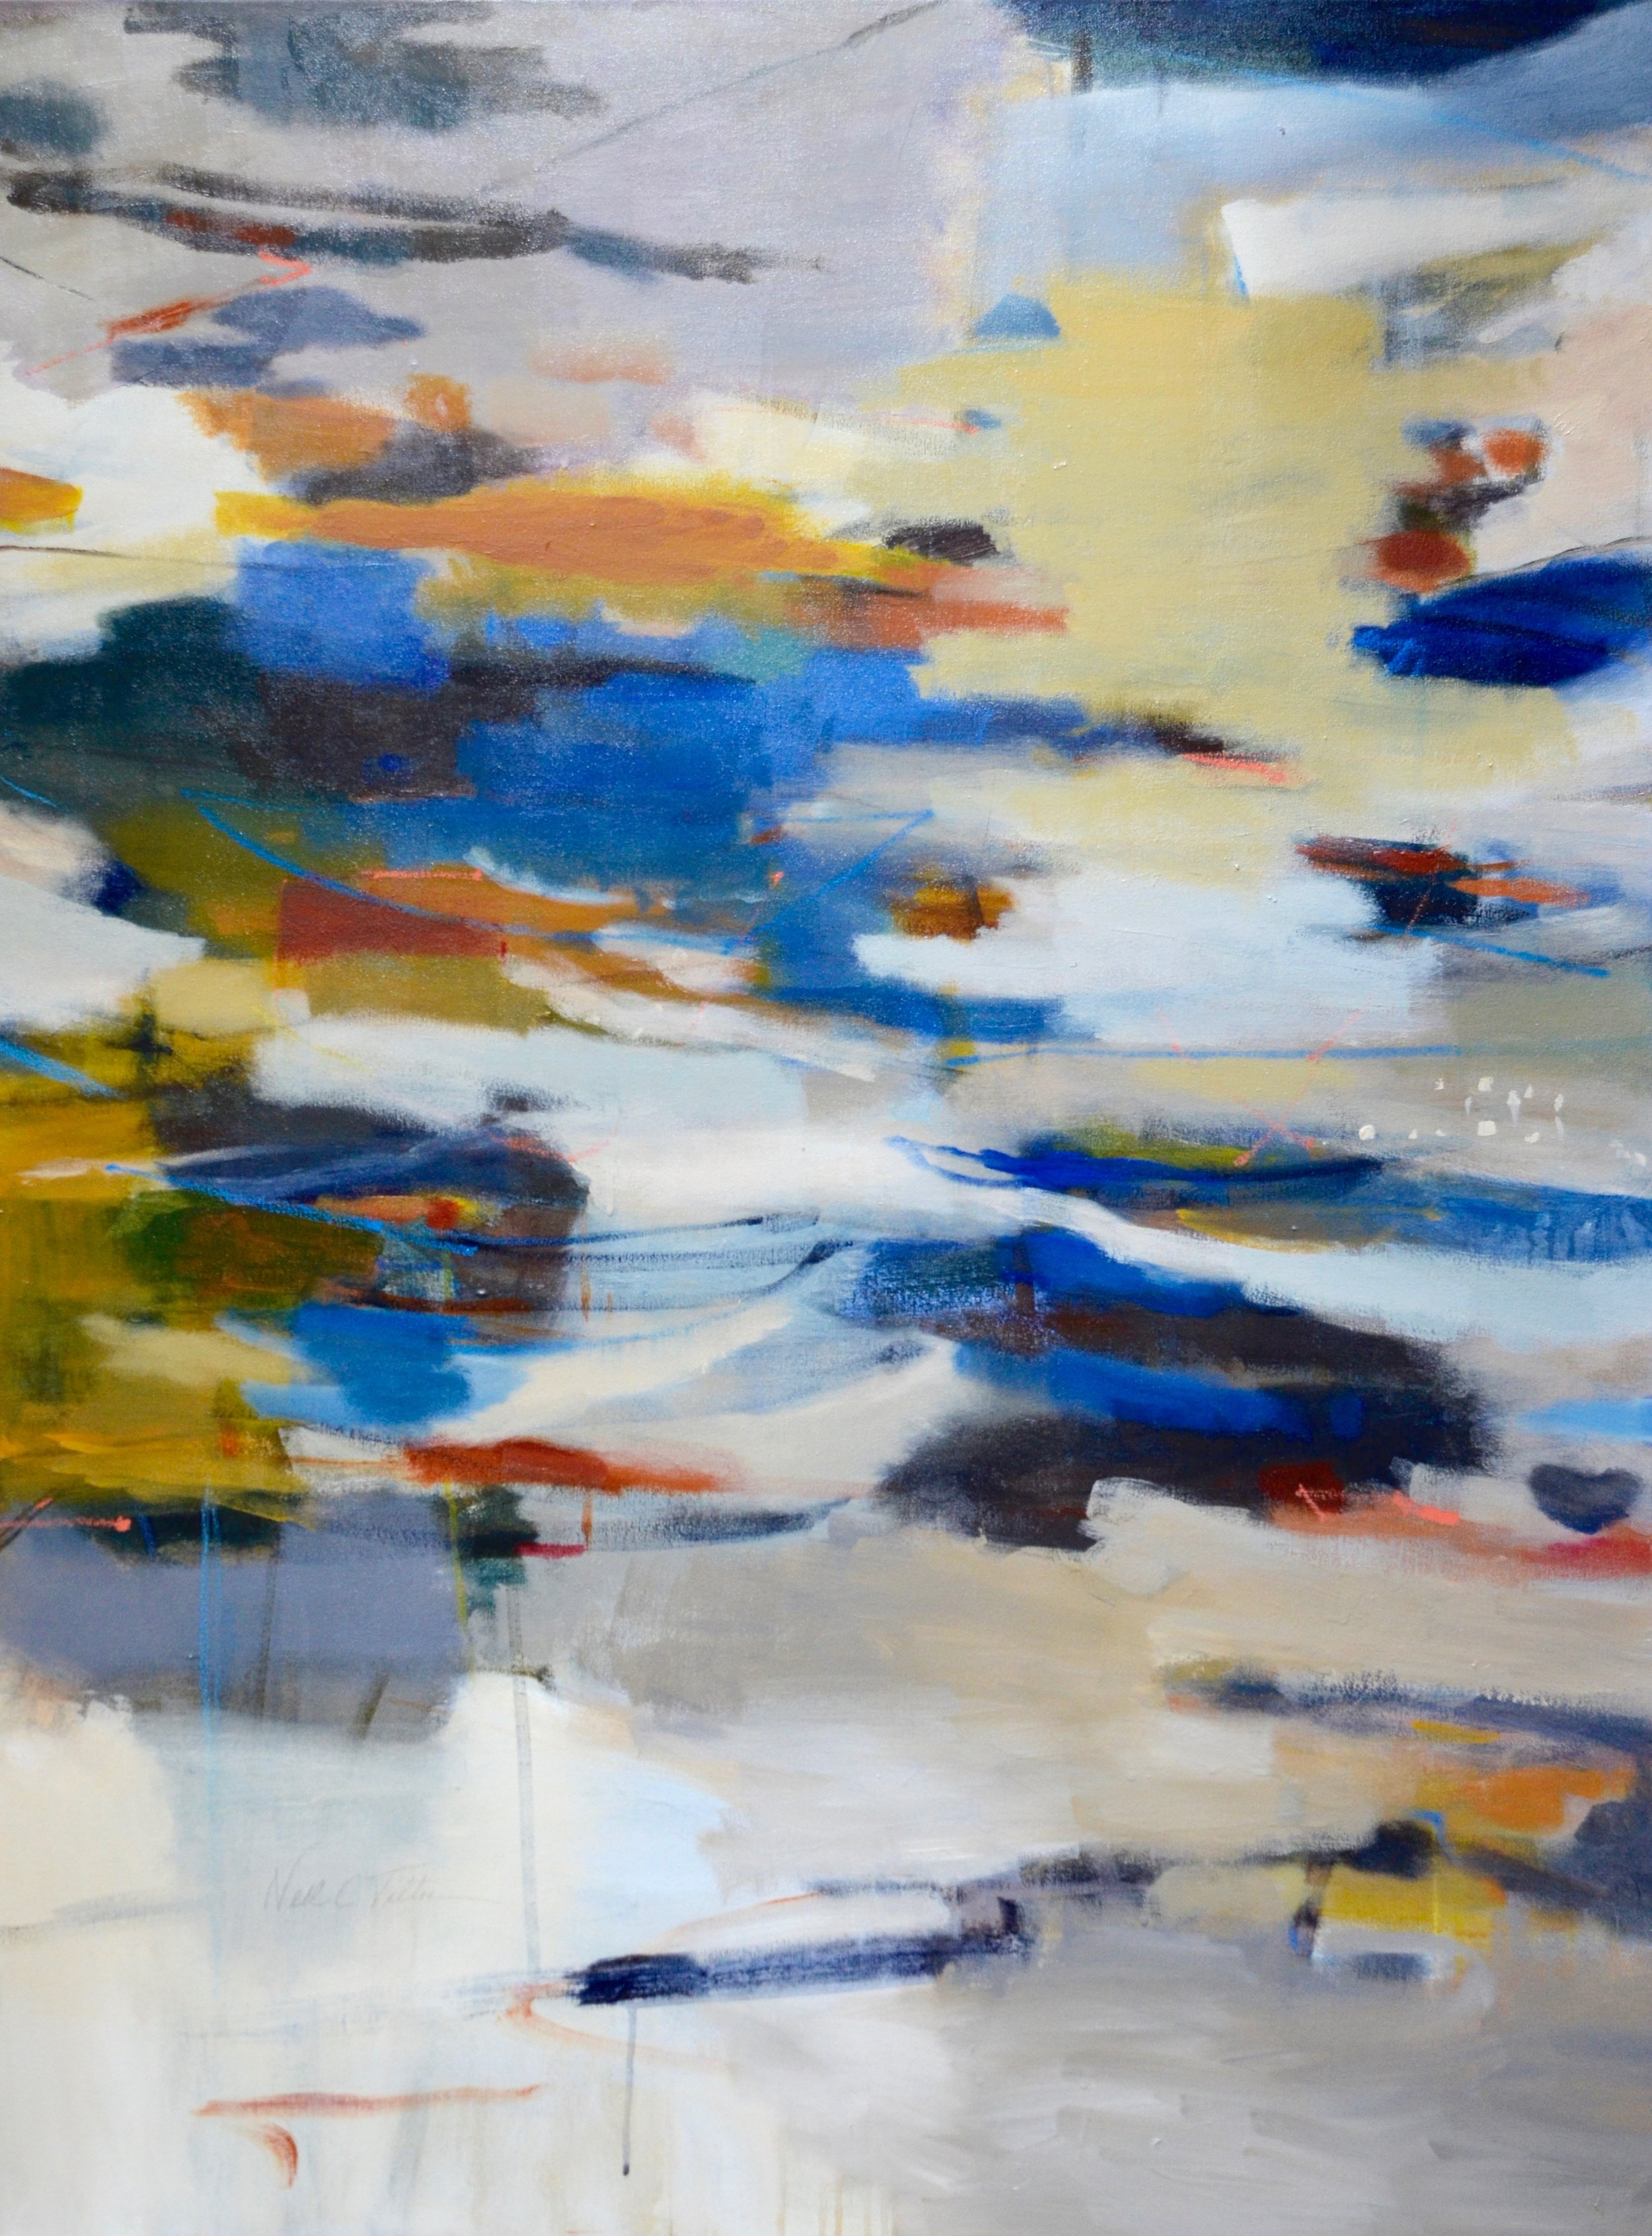 DRIFTING  48 x 36  Acrylic/Mixed Media on Canvas